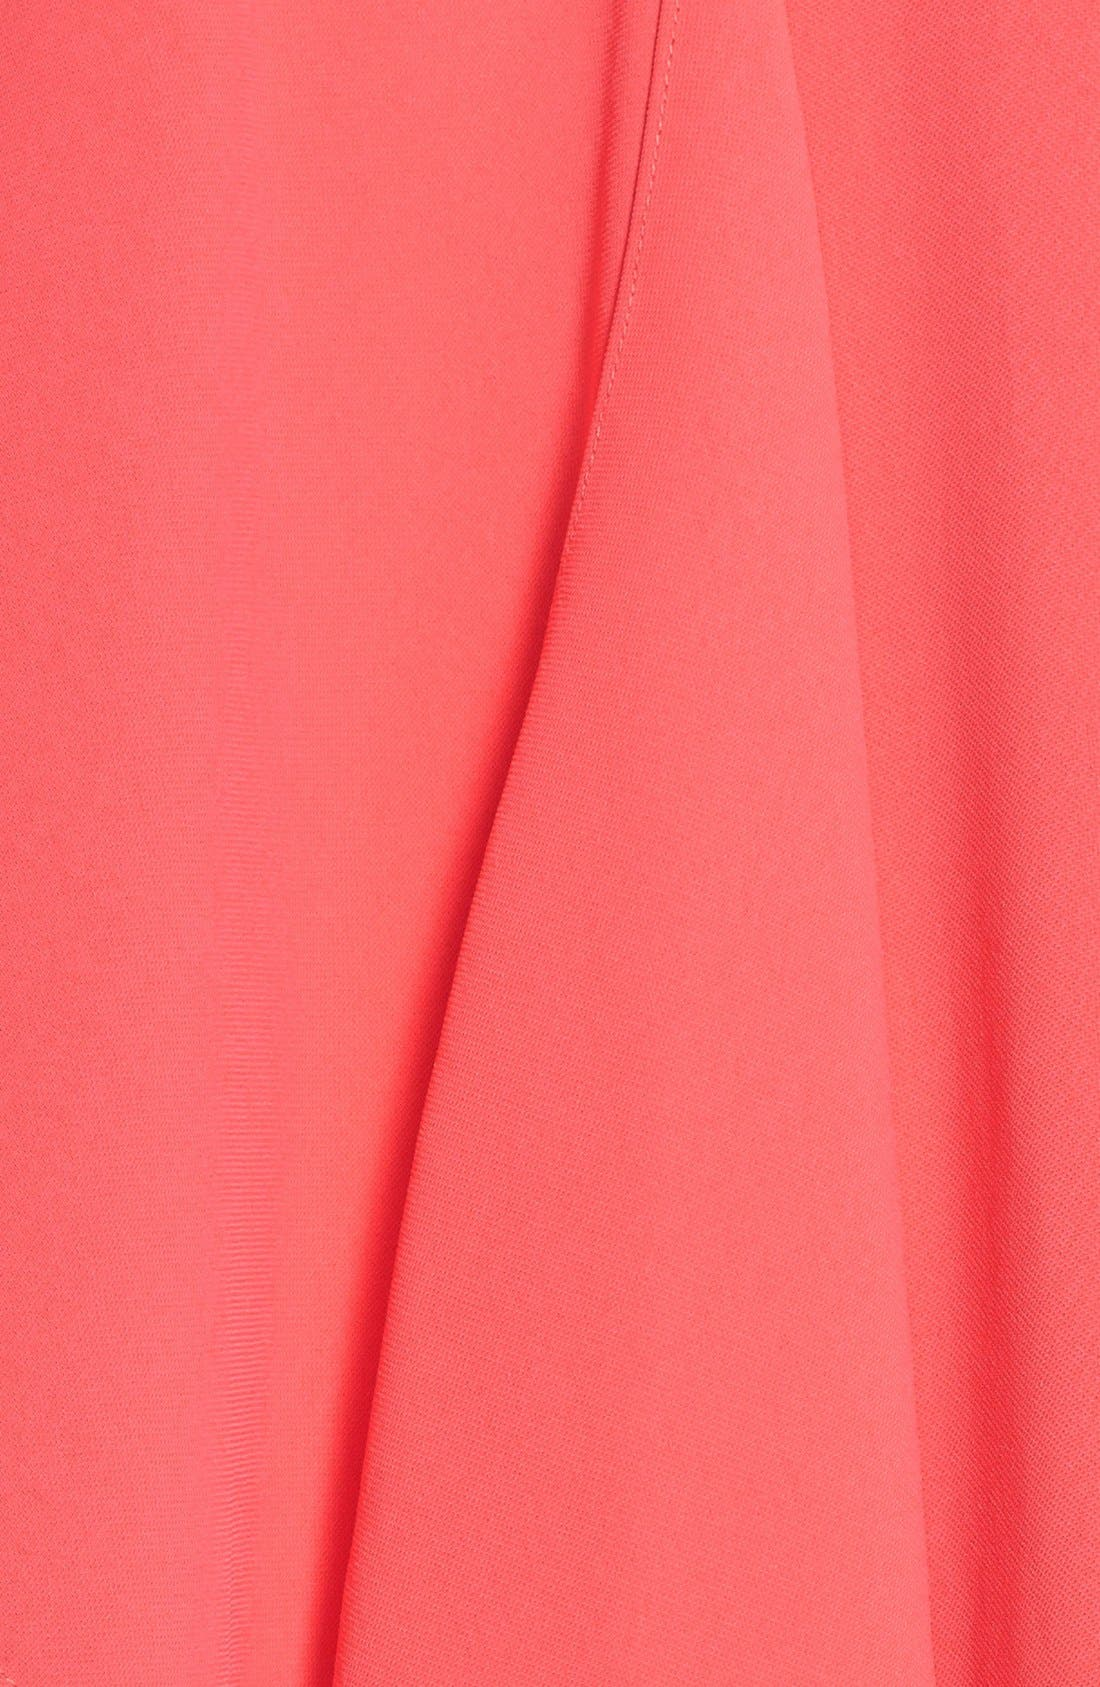 Ruffle Front Crepe High/Low Dress,                             Alternate thumbnail 4, color,                             Grapefruit